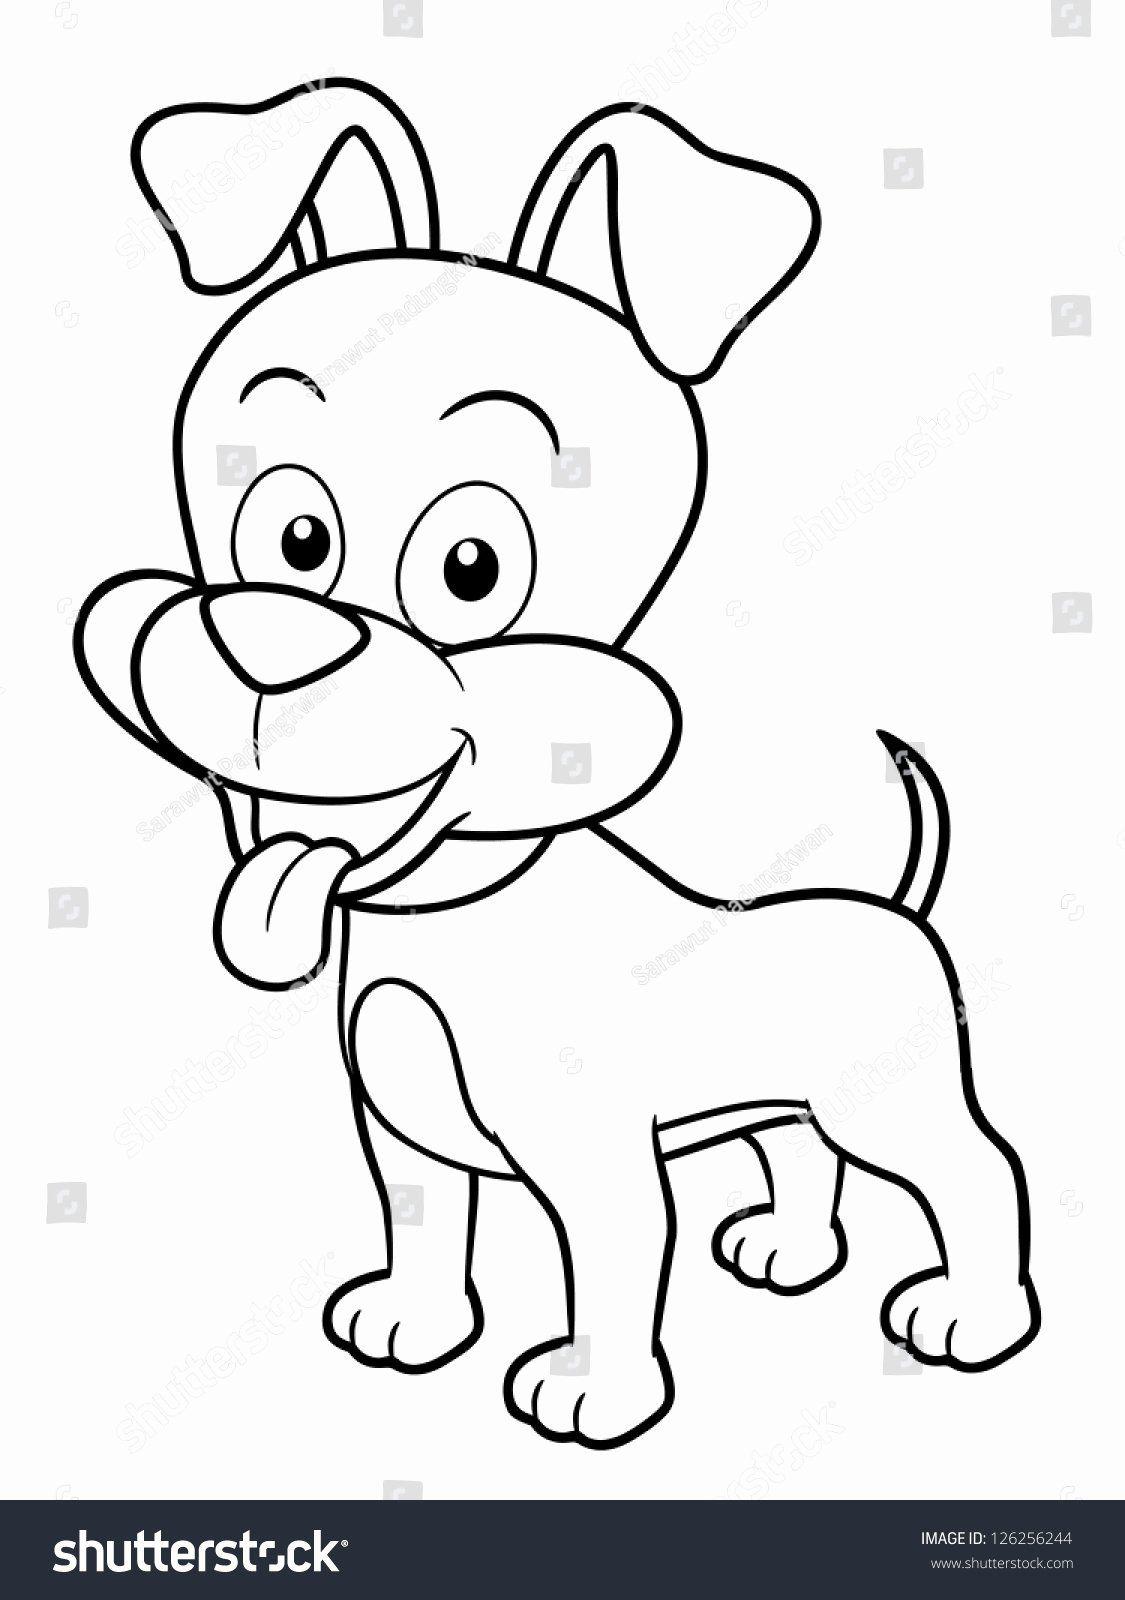 Cartoon Dog Coloring Pages Unique Illustration Cartoon Dog Coloring Book Stock Vector Dog Coloring Book Dog Outline Cartoon Dog